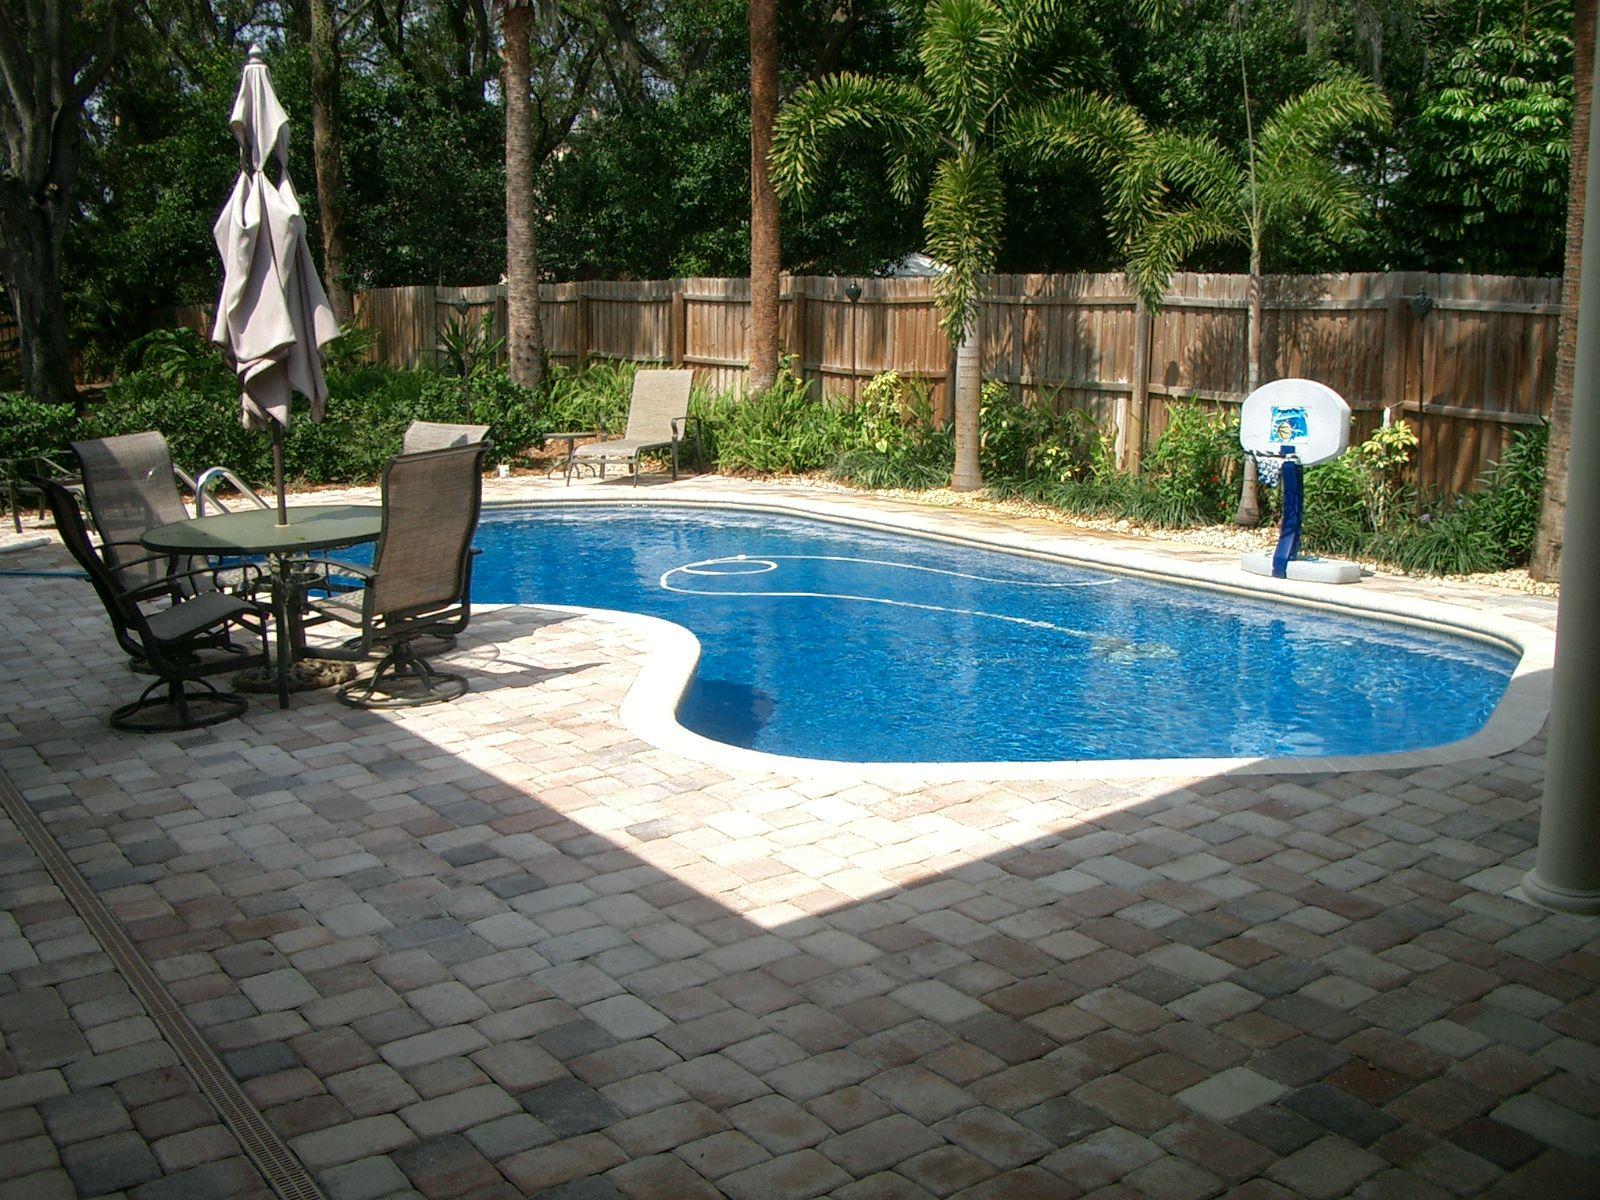 Backyard Landscaping Ideas Swimming Pool Minimalist Design